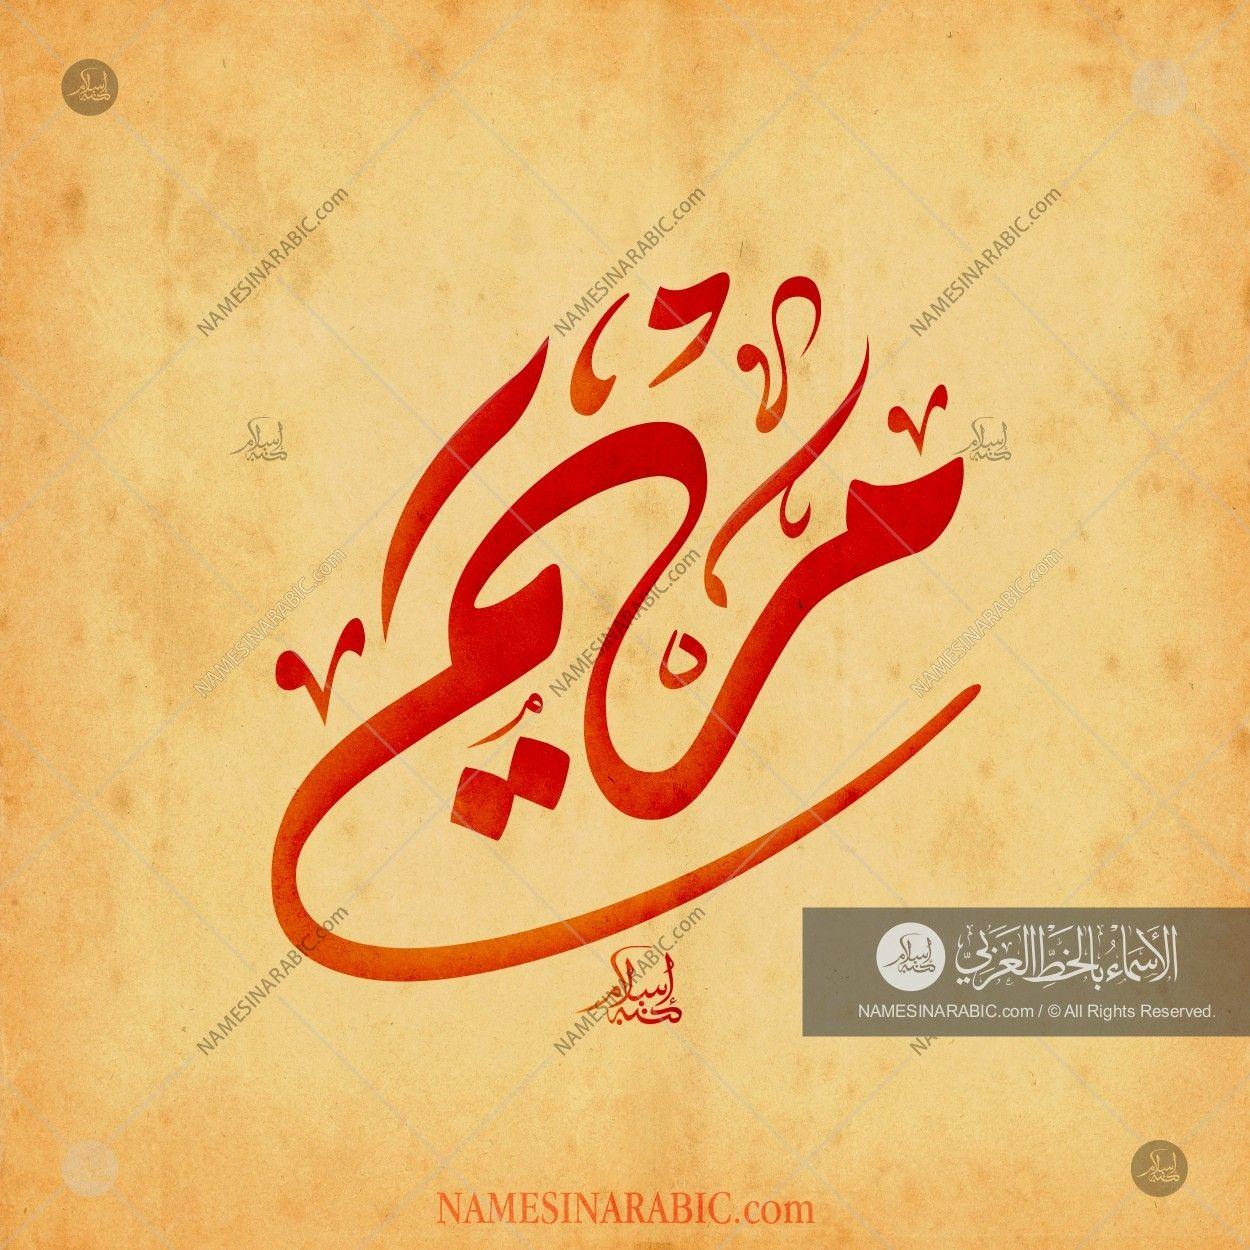 Maryam مريم Names In Arabic Calligraphy Name 4987 Calligraphy Name Calligraphy Islamic Calligraphy Painting